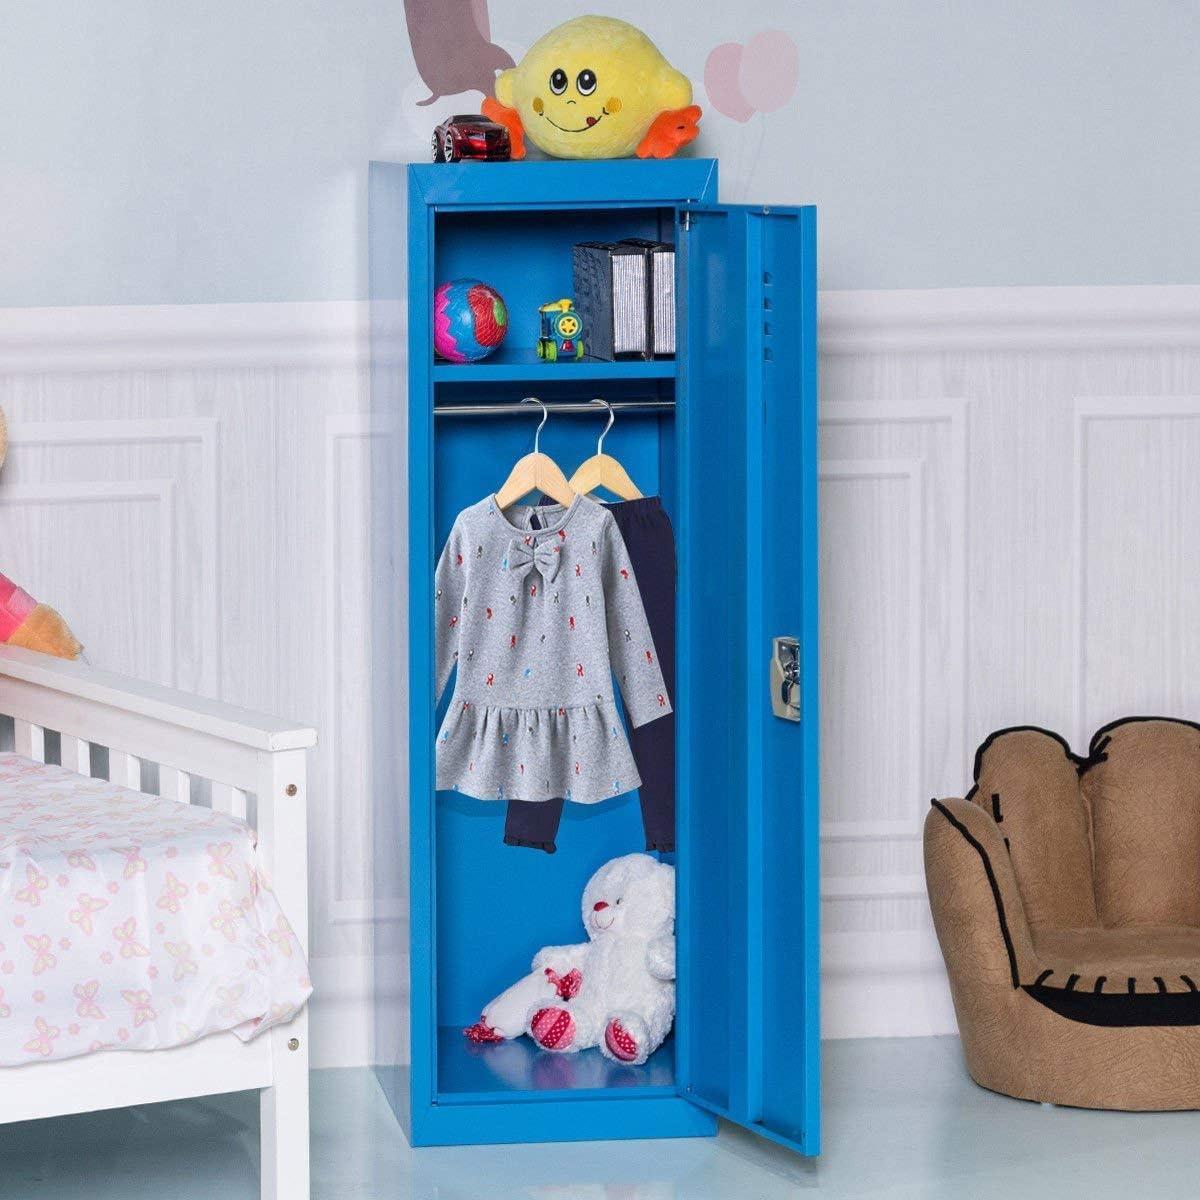 Blue Single Tier Metal Locker HONEY JOY 48 Kids Storage Locker Lock and Key Safe Storage